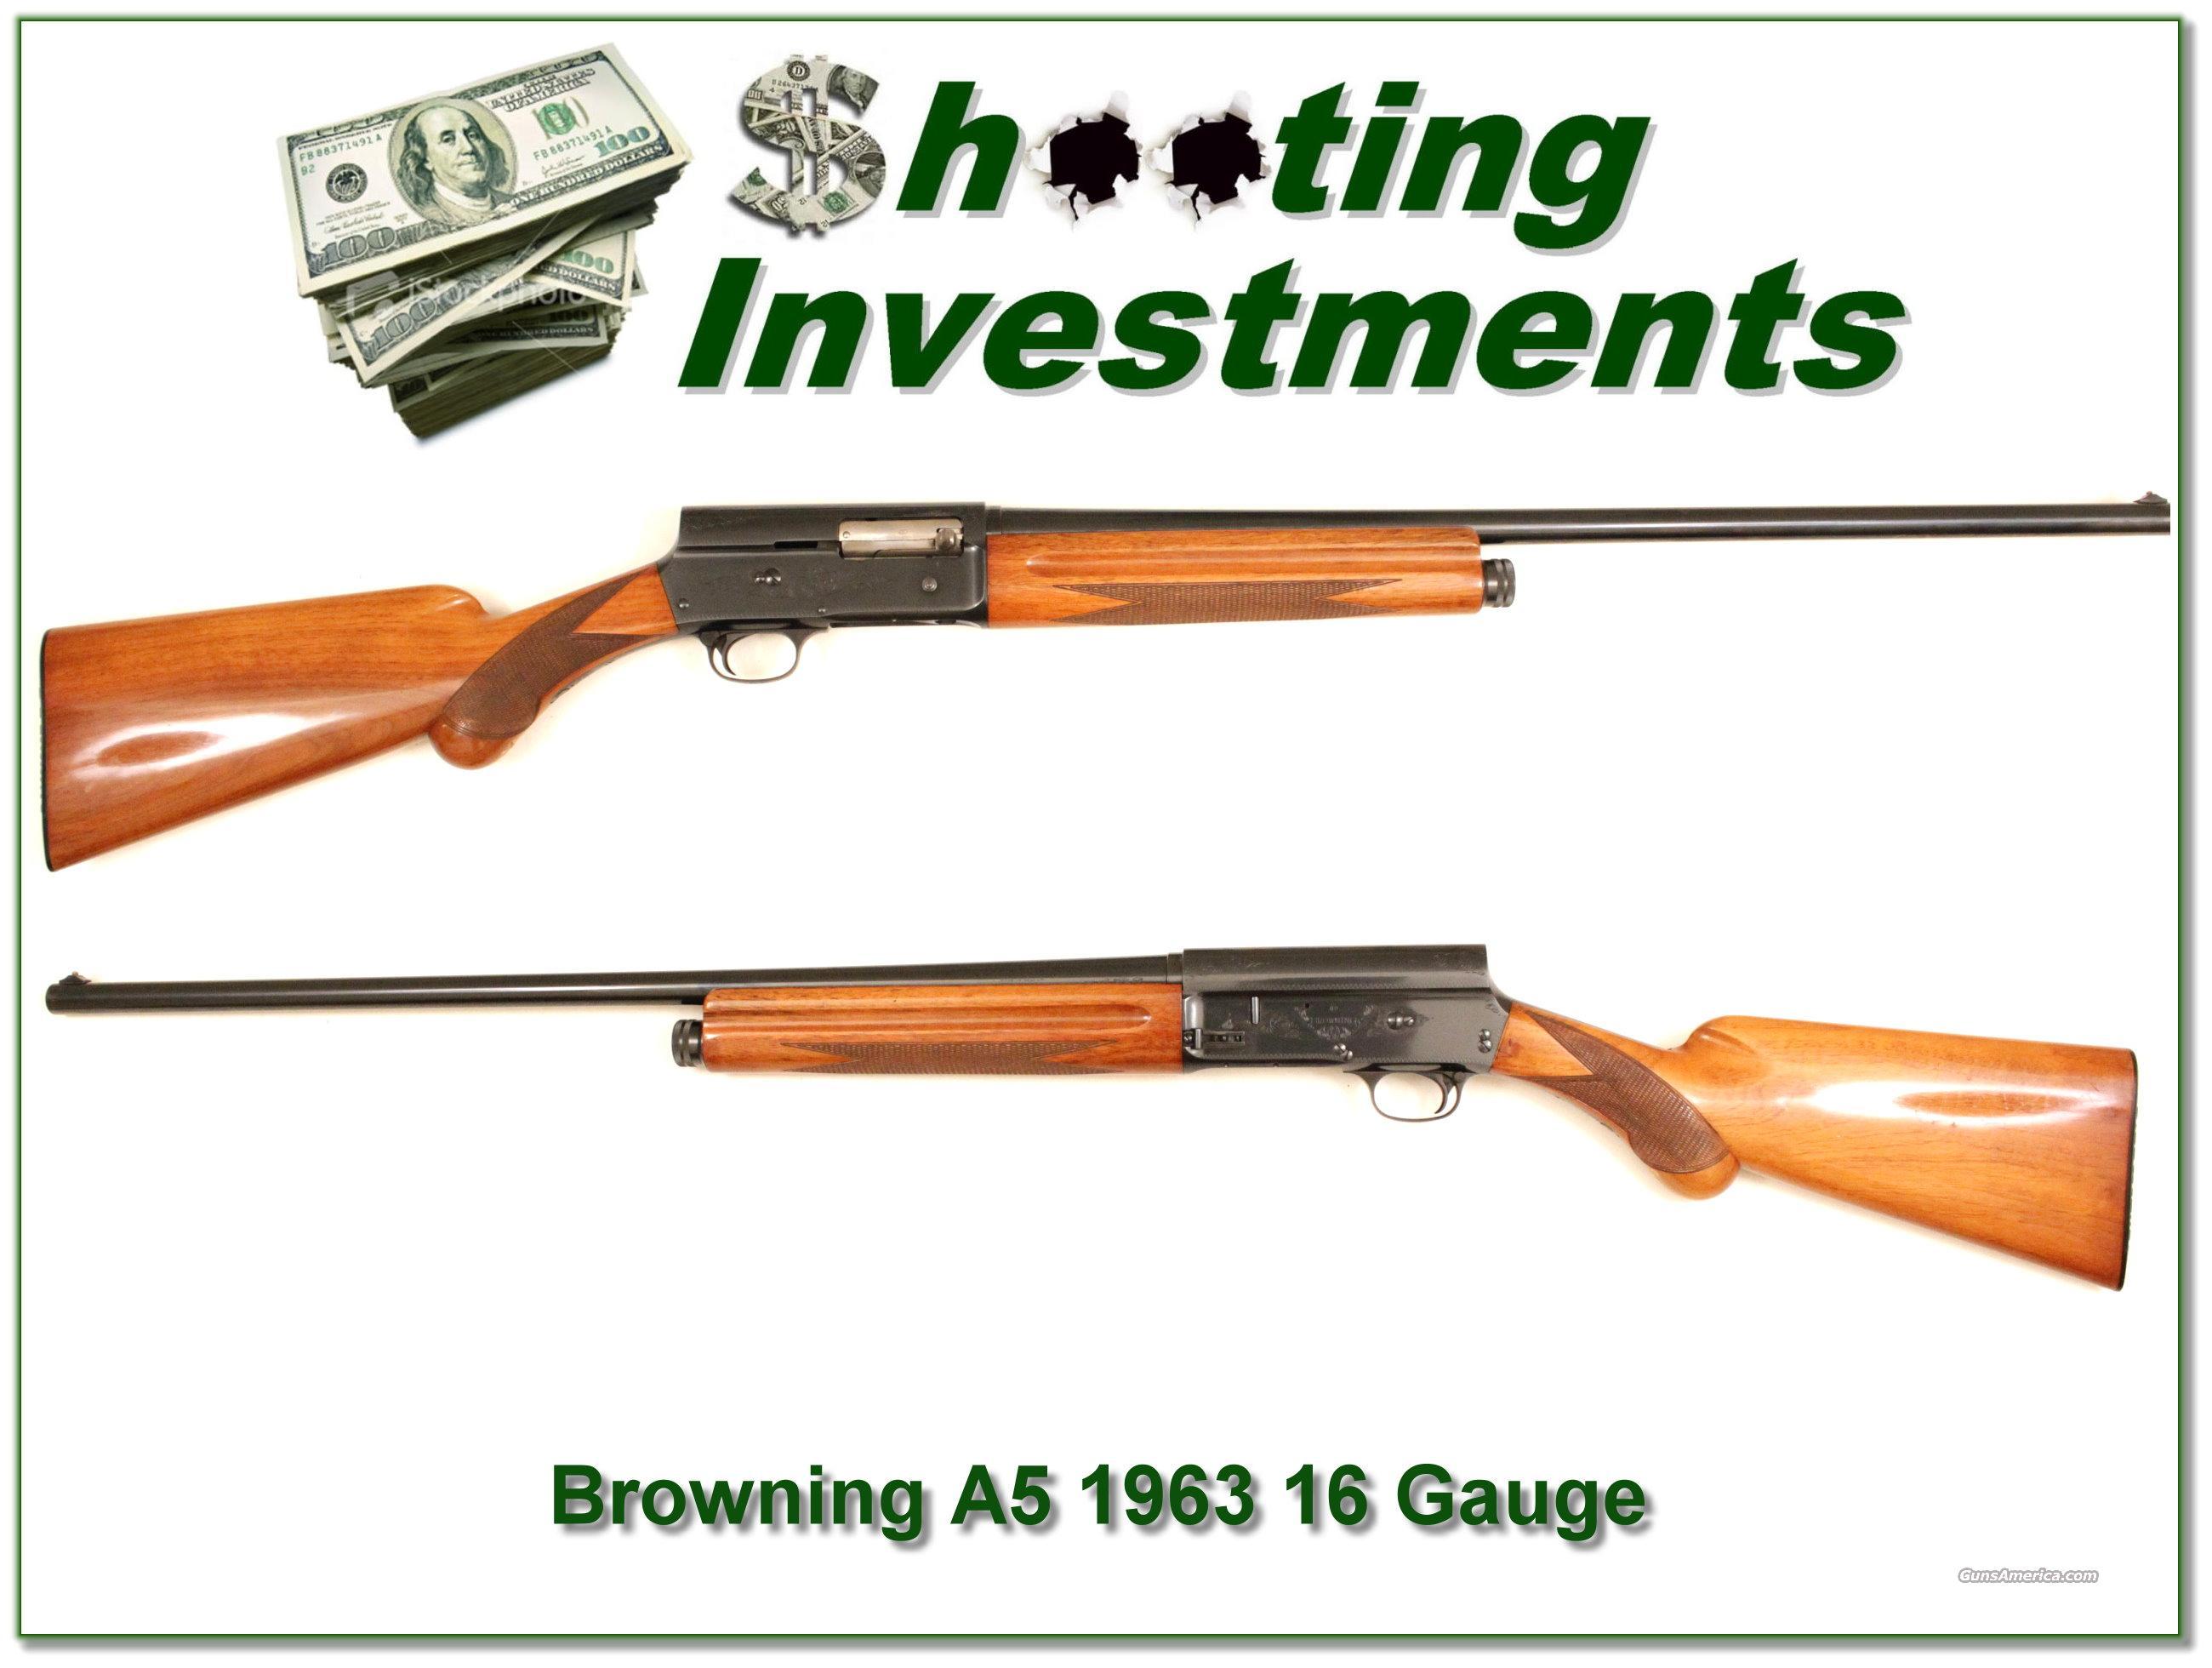 Browning A5 16 gauges 1963 Belgium Exc Cond!  Guns > Shotguns > Browning Shotguns > Autoloaders > Hunting